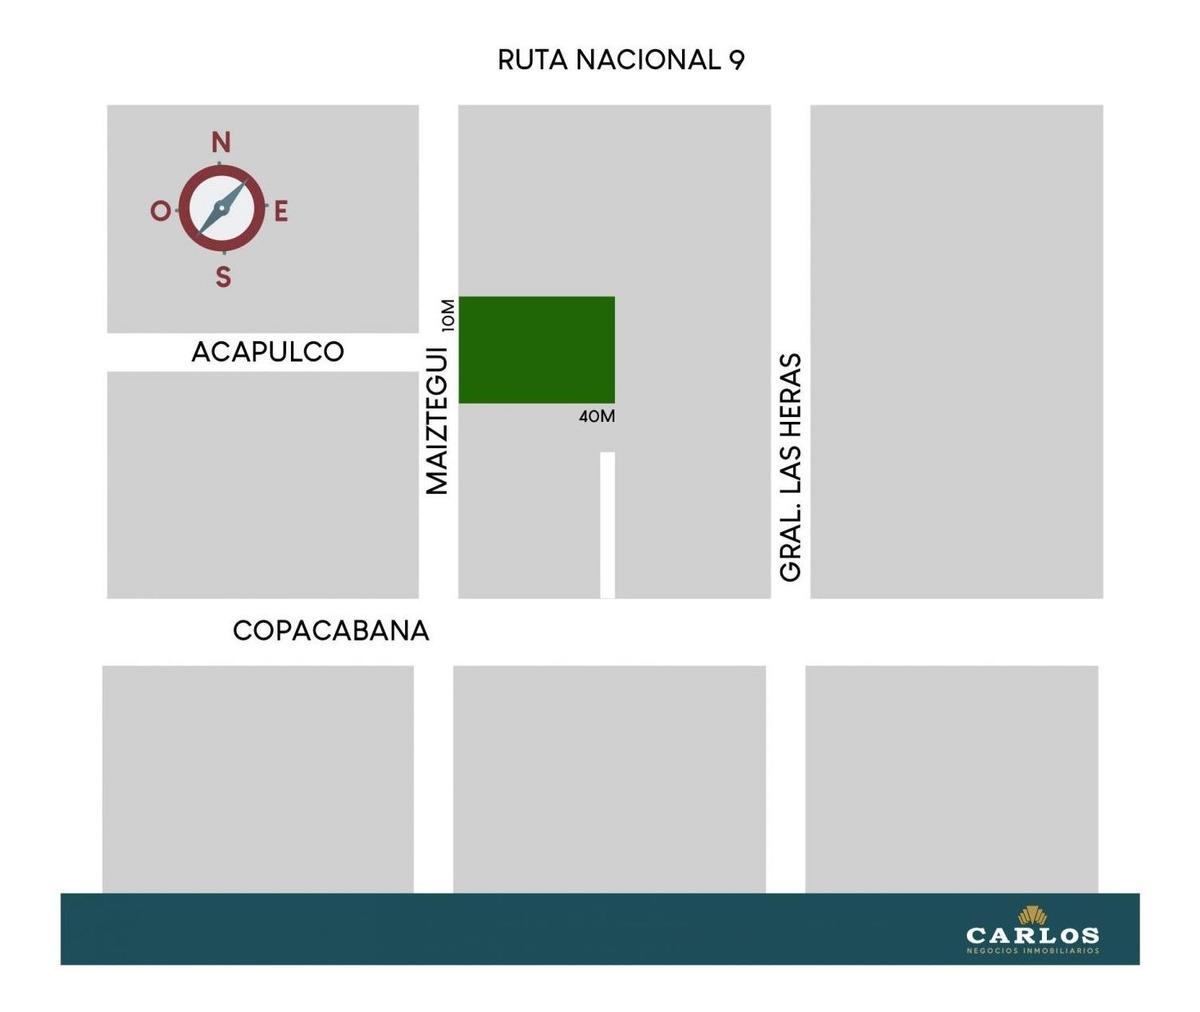 lote 400 m2 sobre calle maiztegui y acapulco (80 mts ruta)